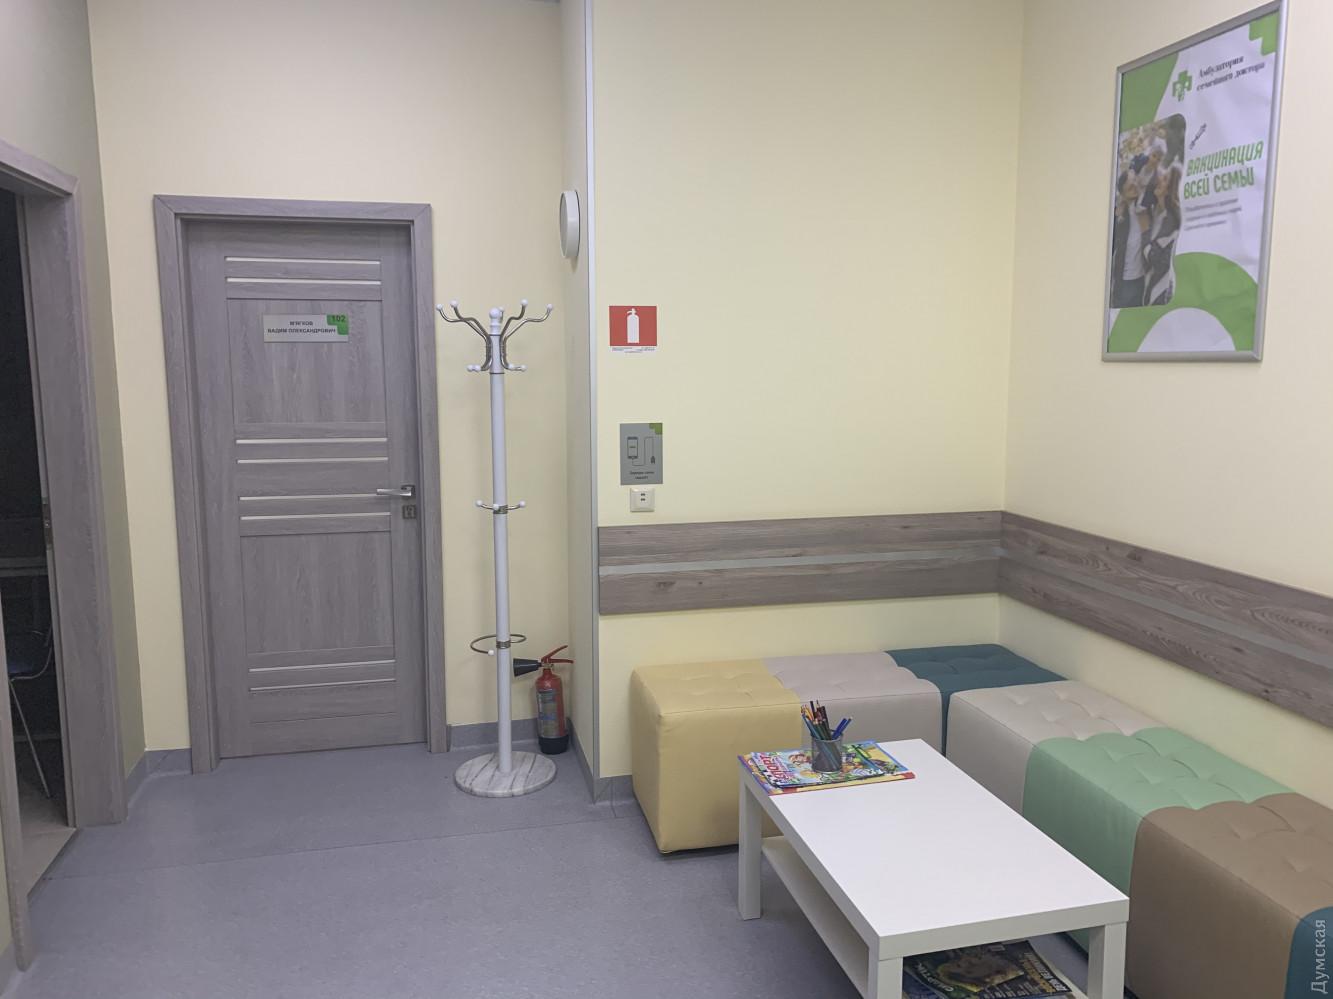 Частная амбулатория